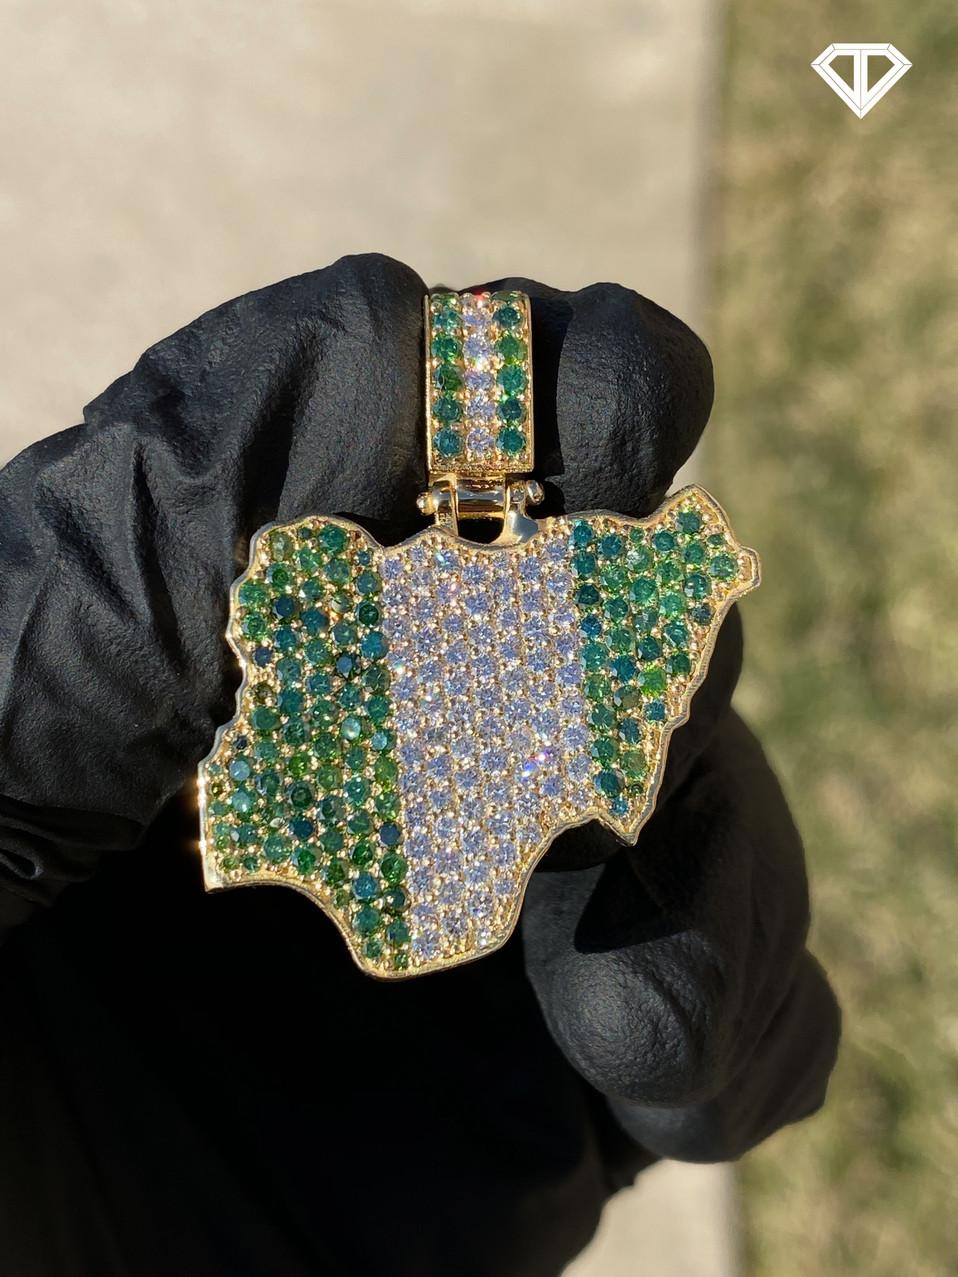 VS1 Custom 18k Nigeria Charm with Colored Diamonds